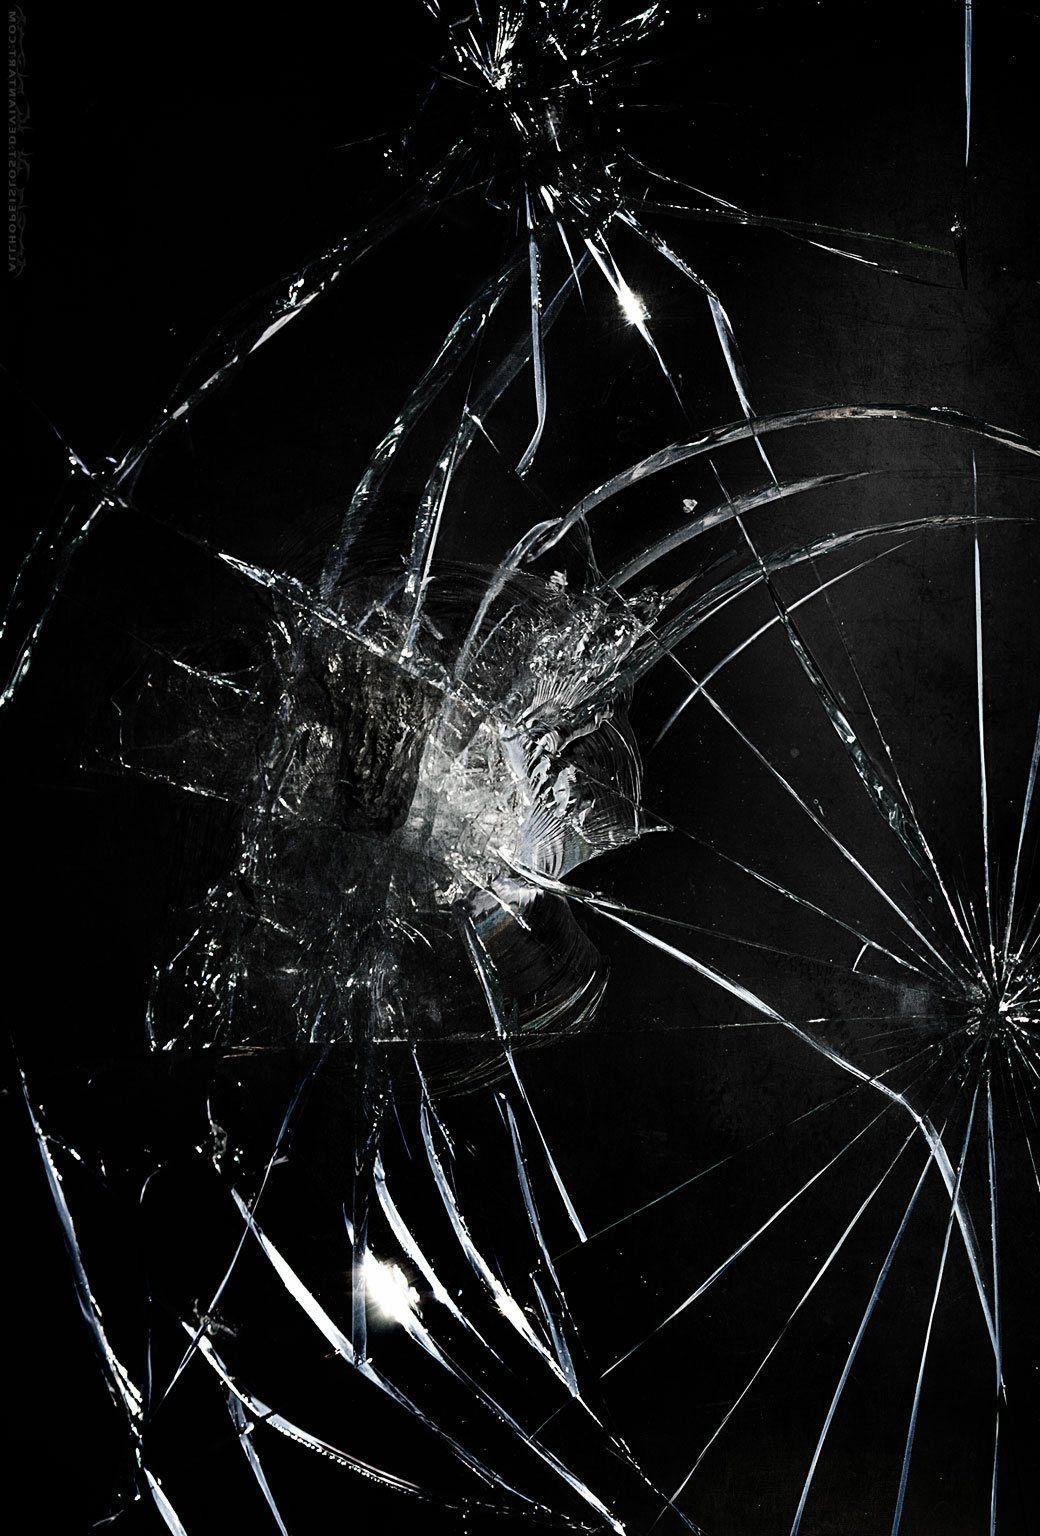 Iphone 11 Cracked Screen Wallpaper